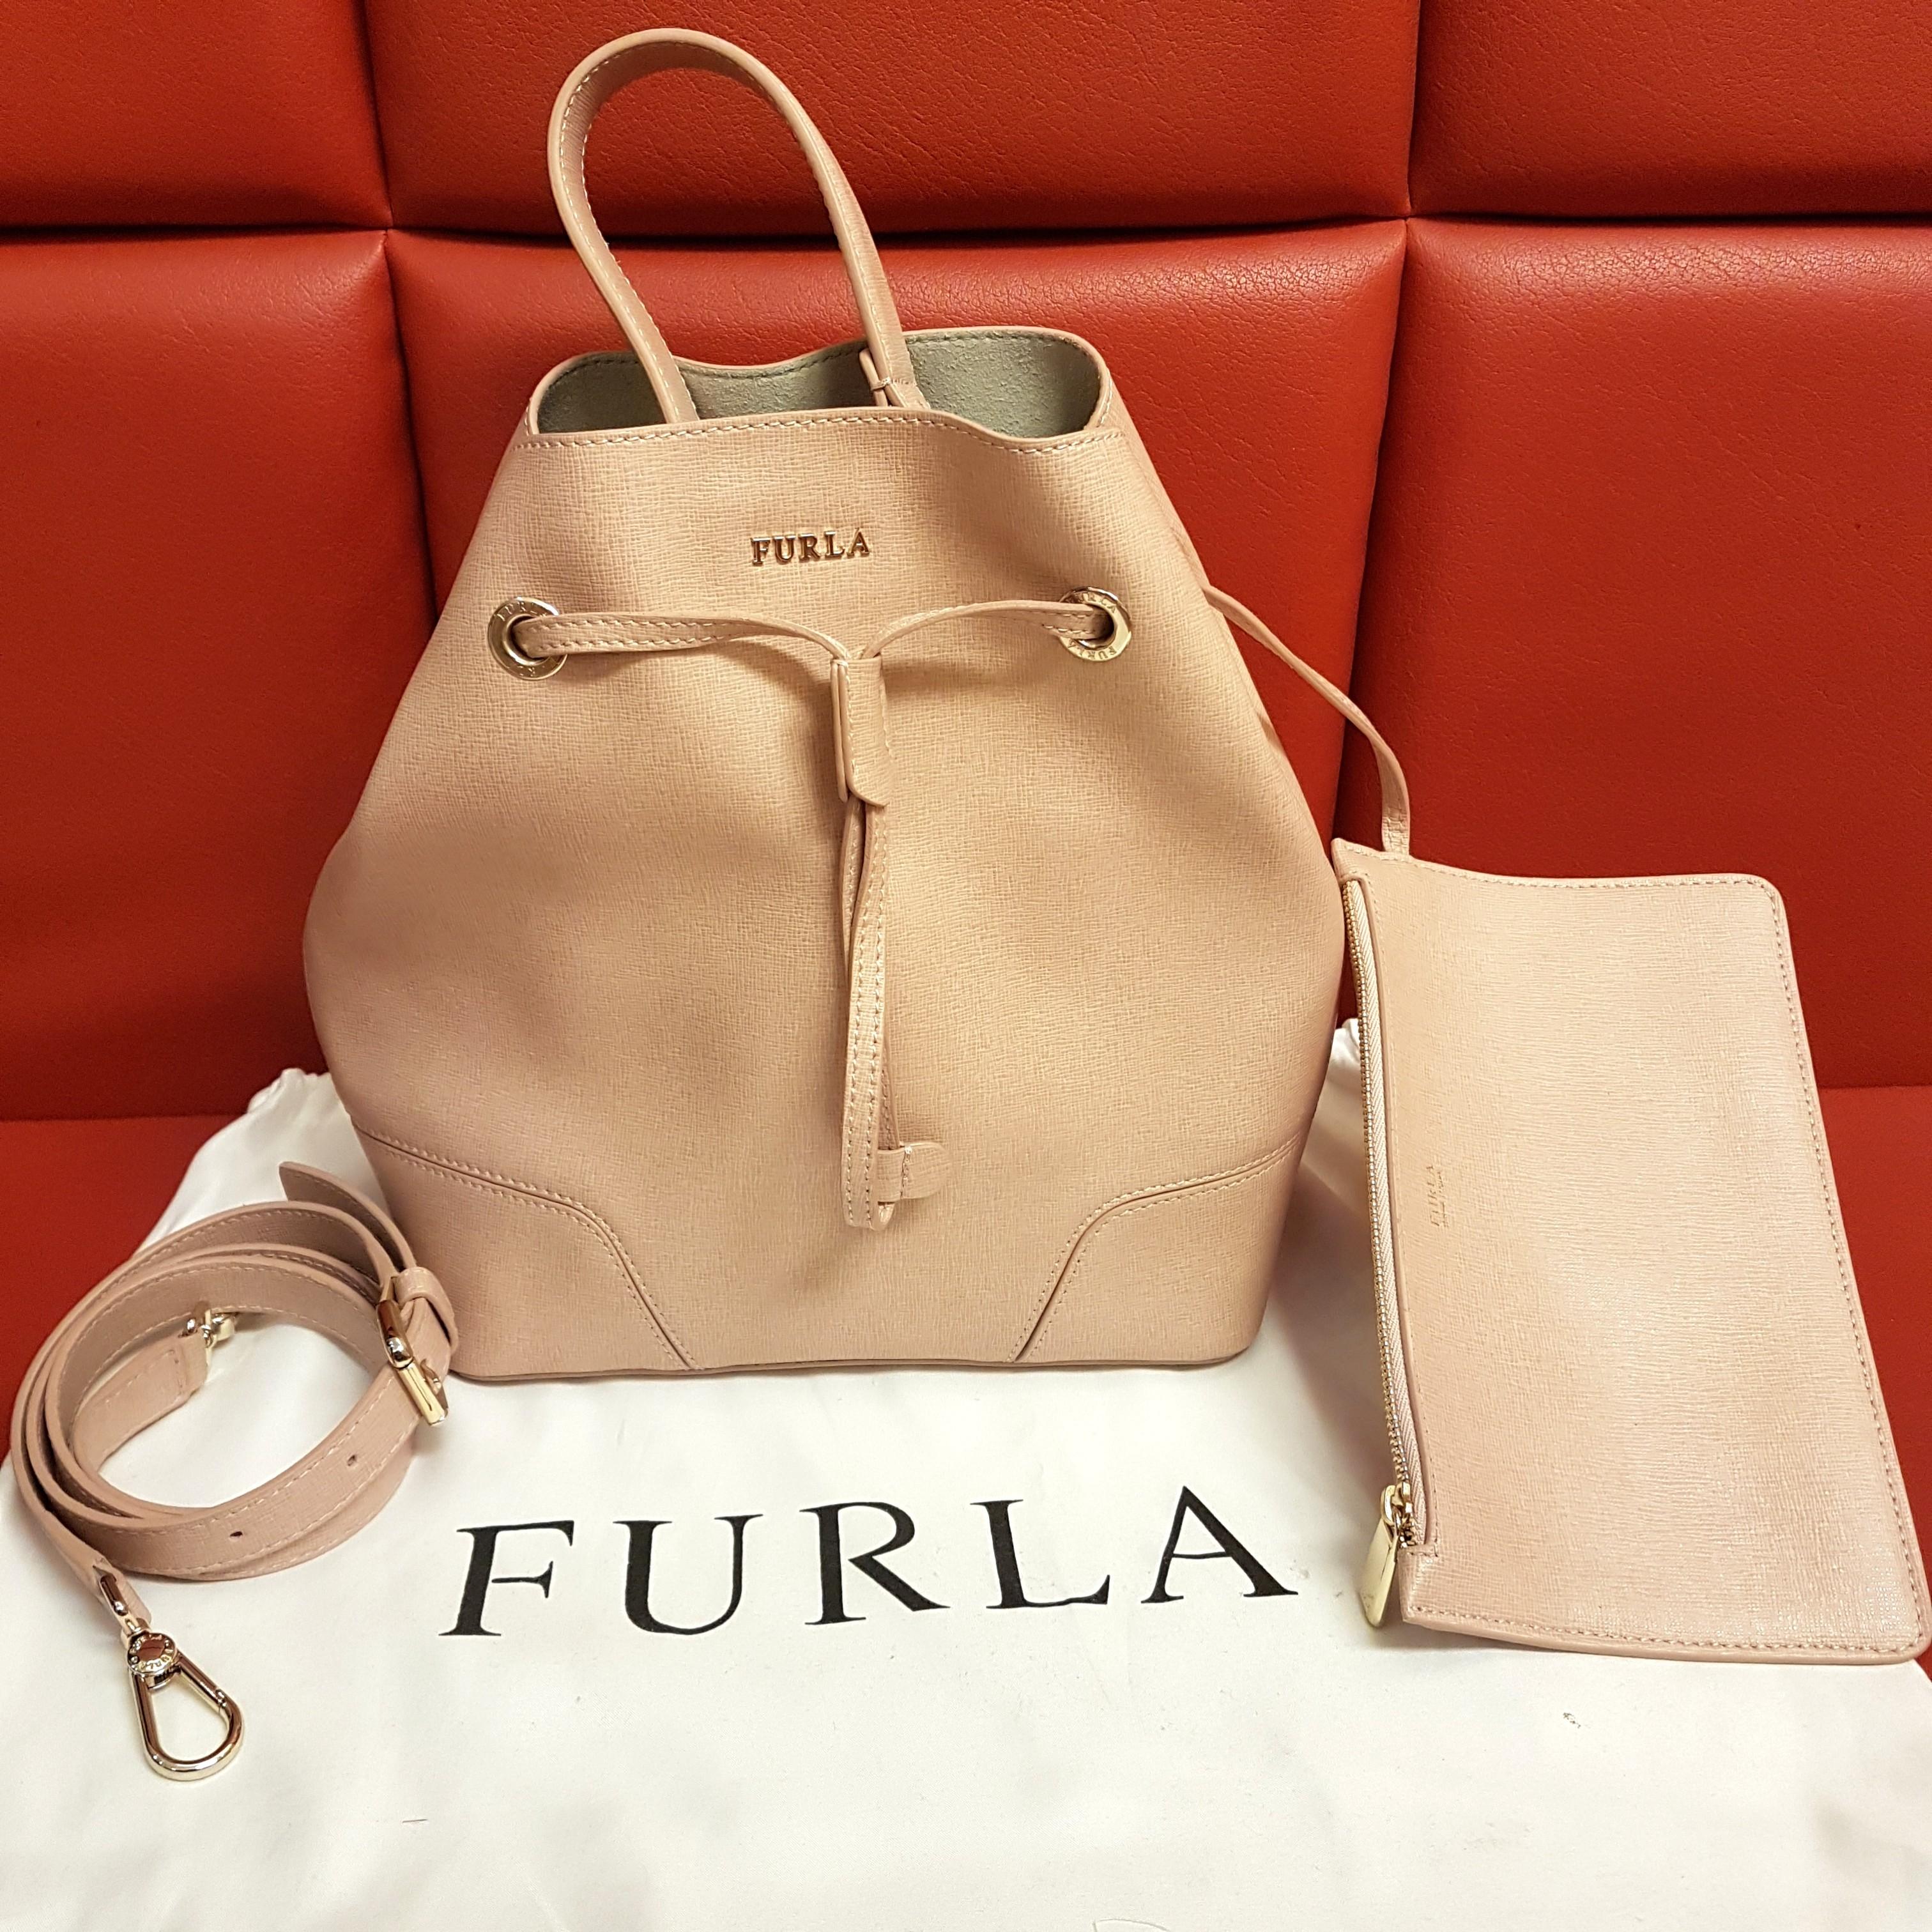 aacca644ed Furla Stacy Small Saffiano Drawstring Bucket Bag